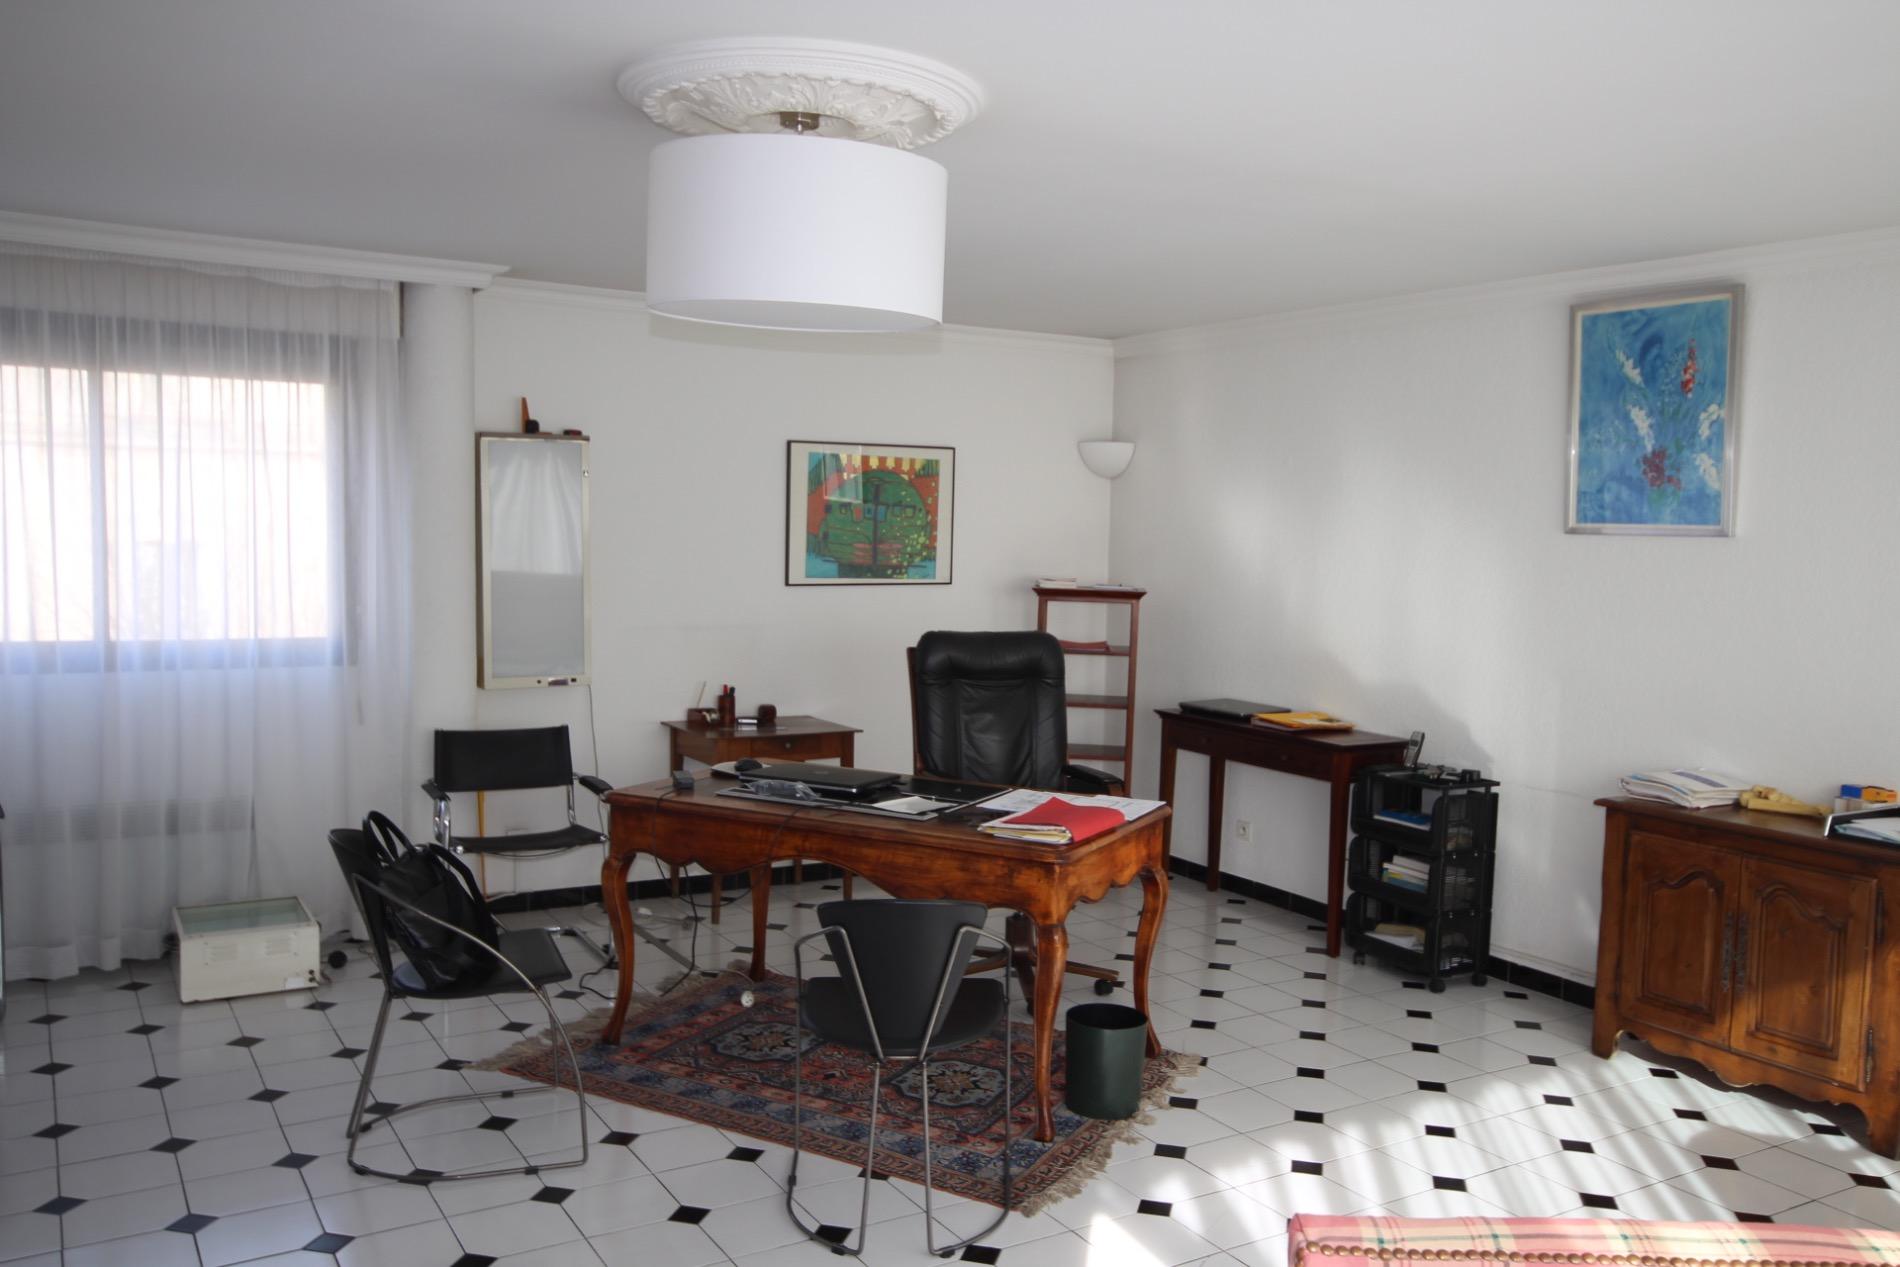 maison medicale trets maison medicale trets with maison medicale trets beautiful maison. Black Bedroom Furniture Sets. Home Design Ideas